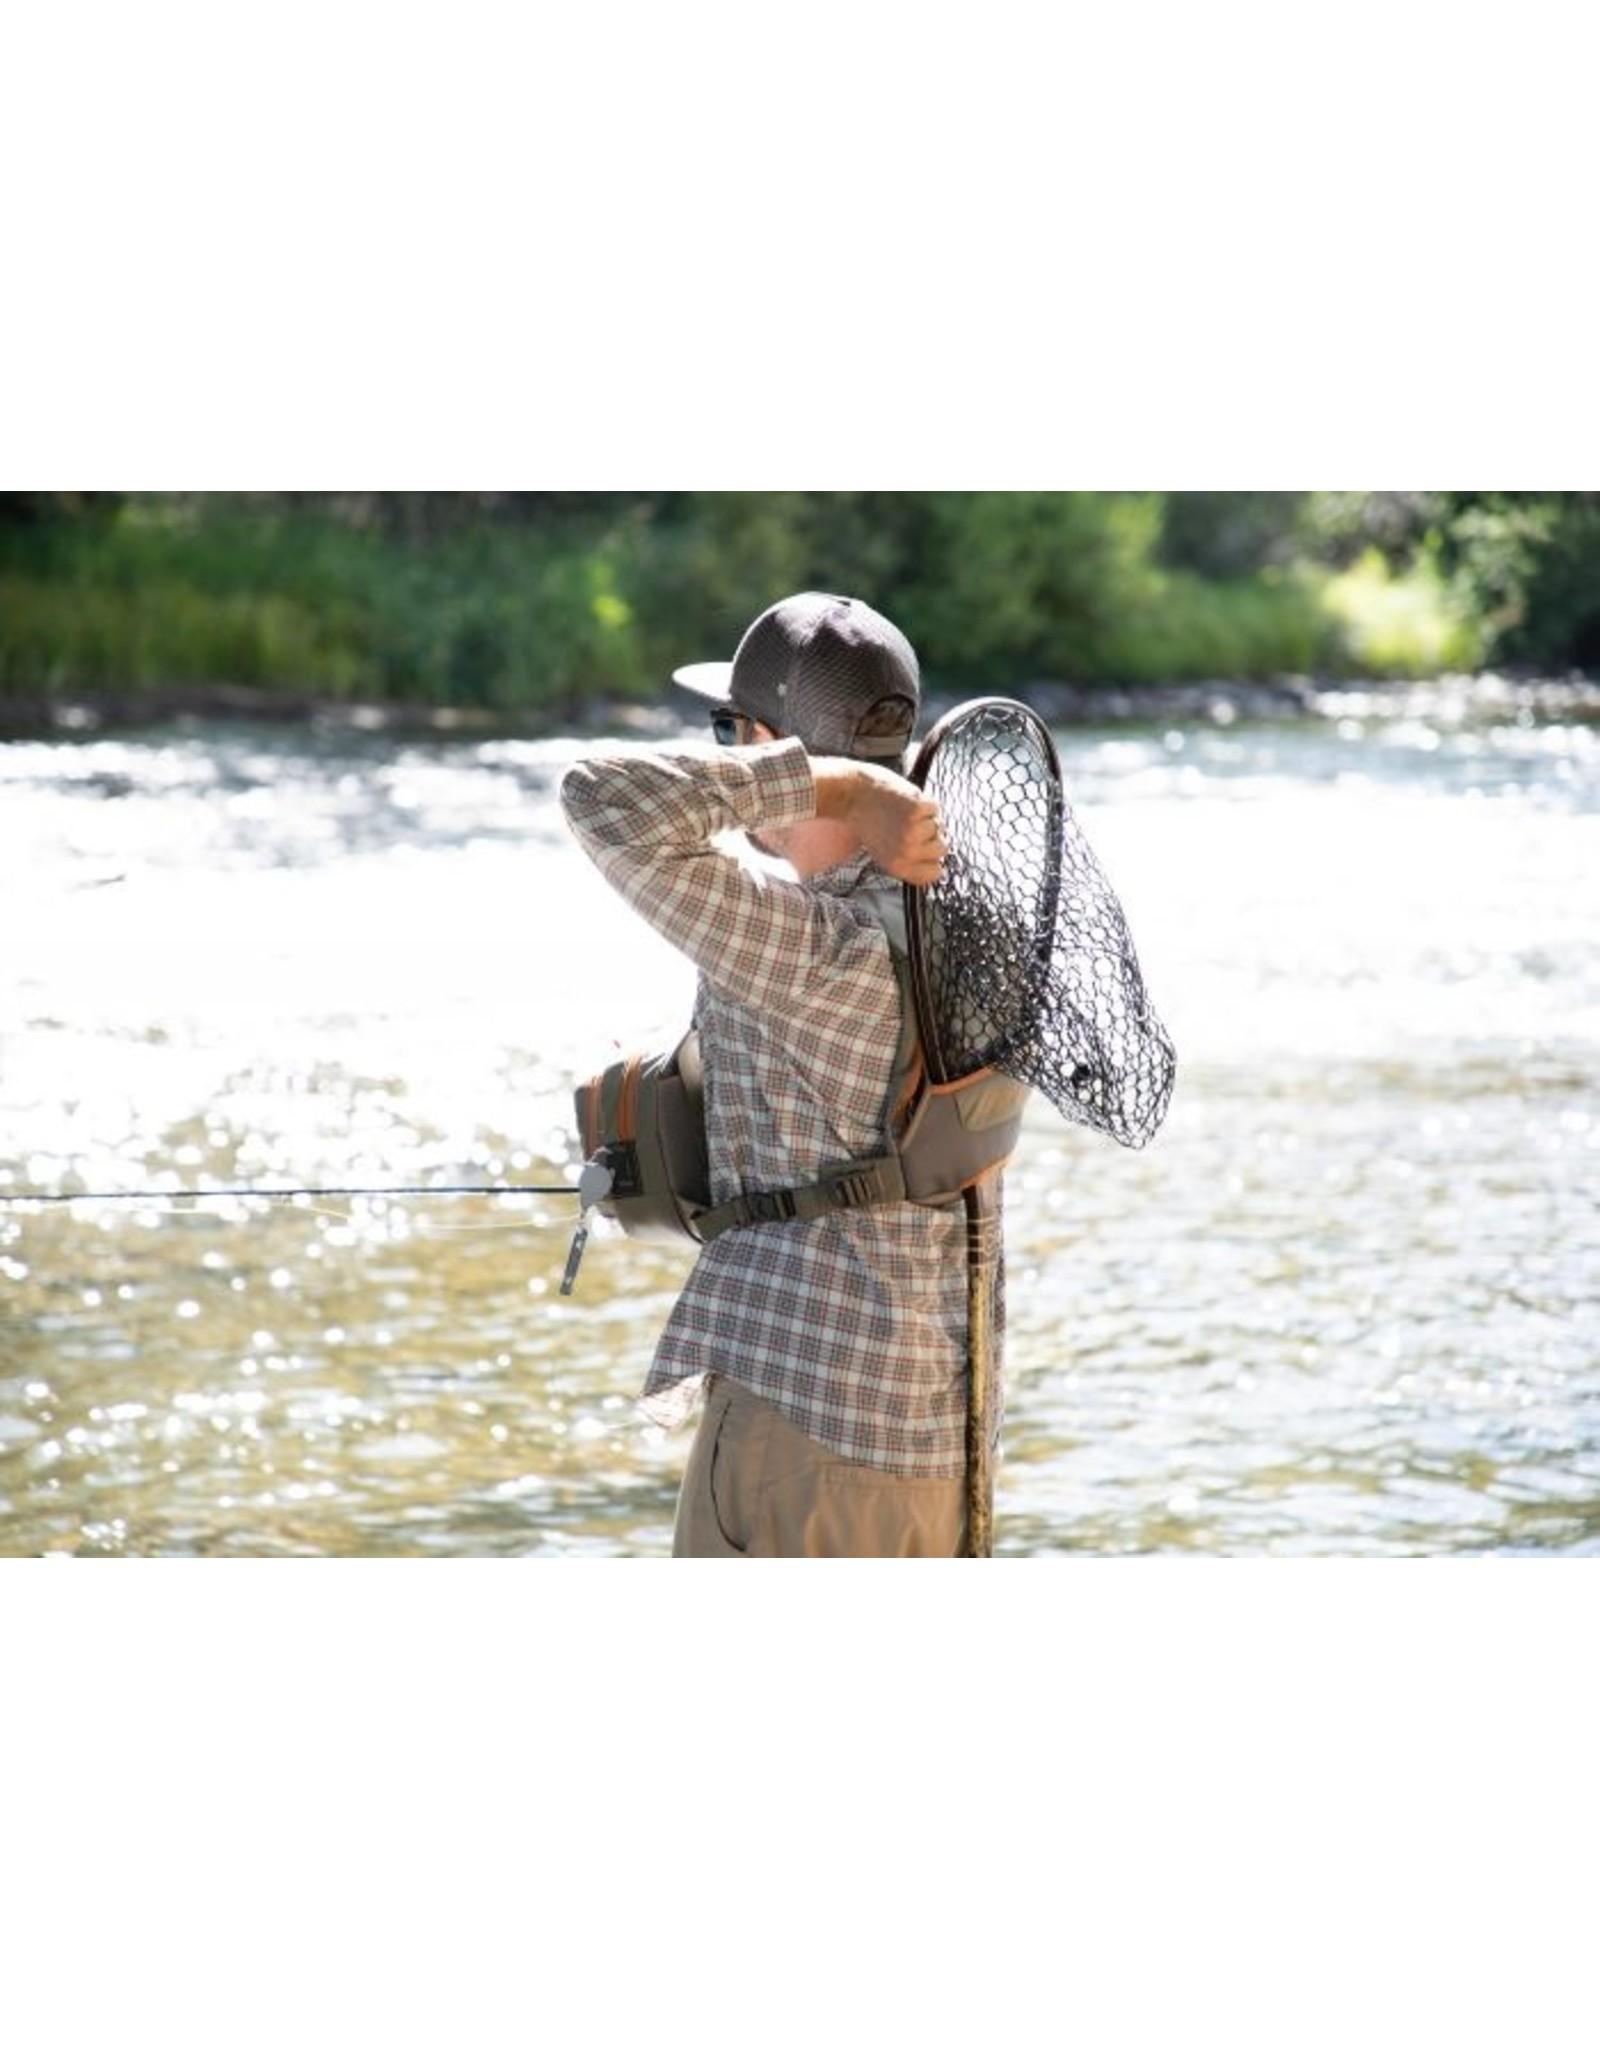 Fishpond 816332011252